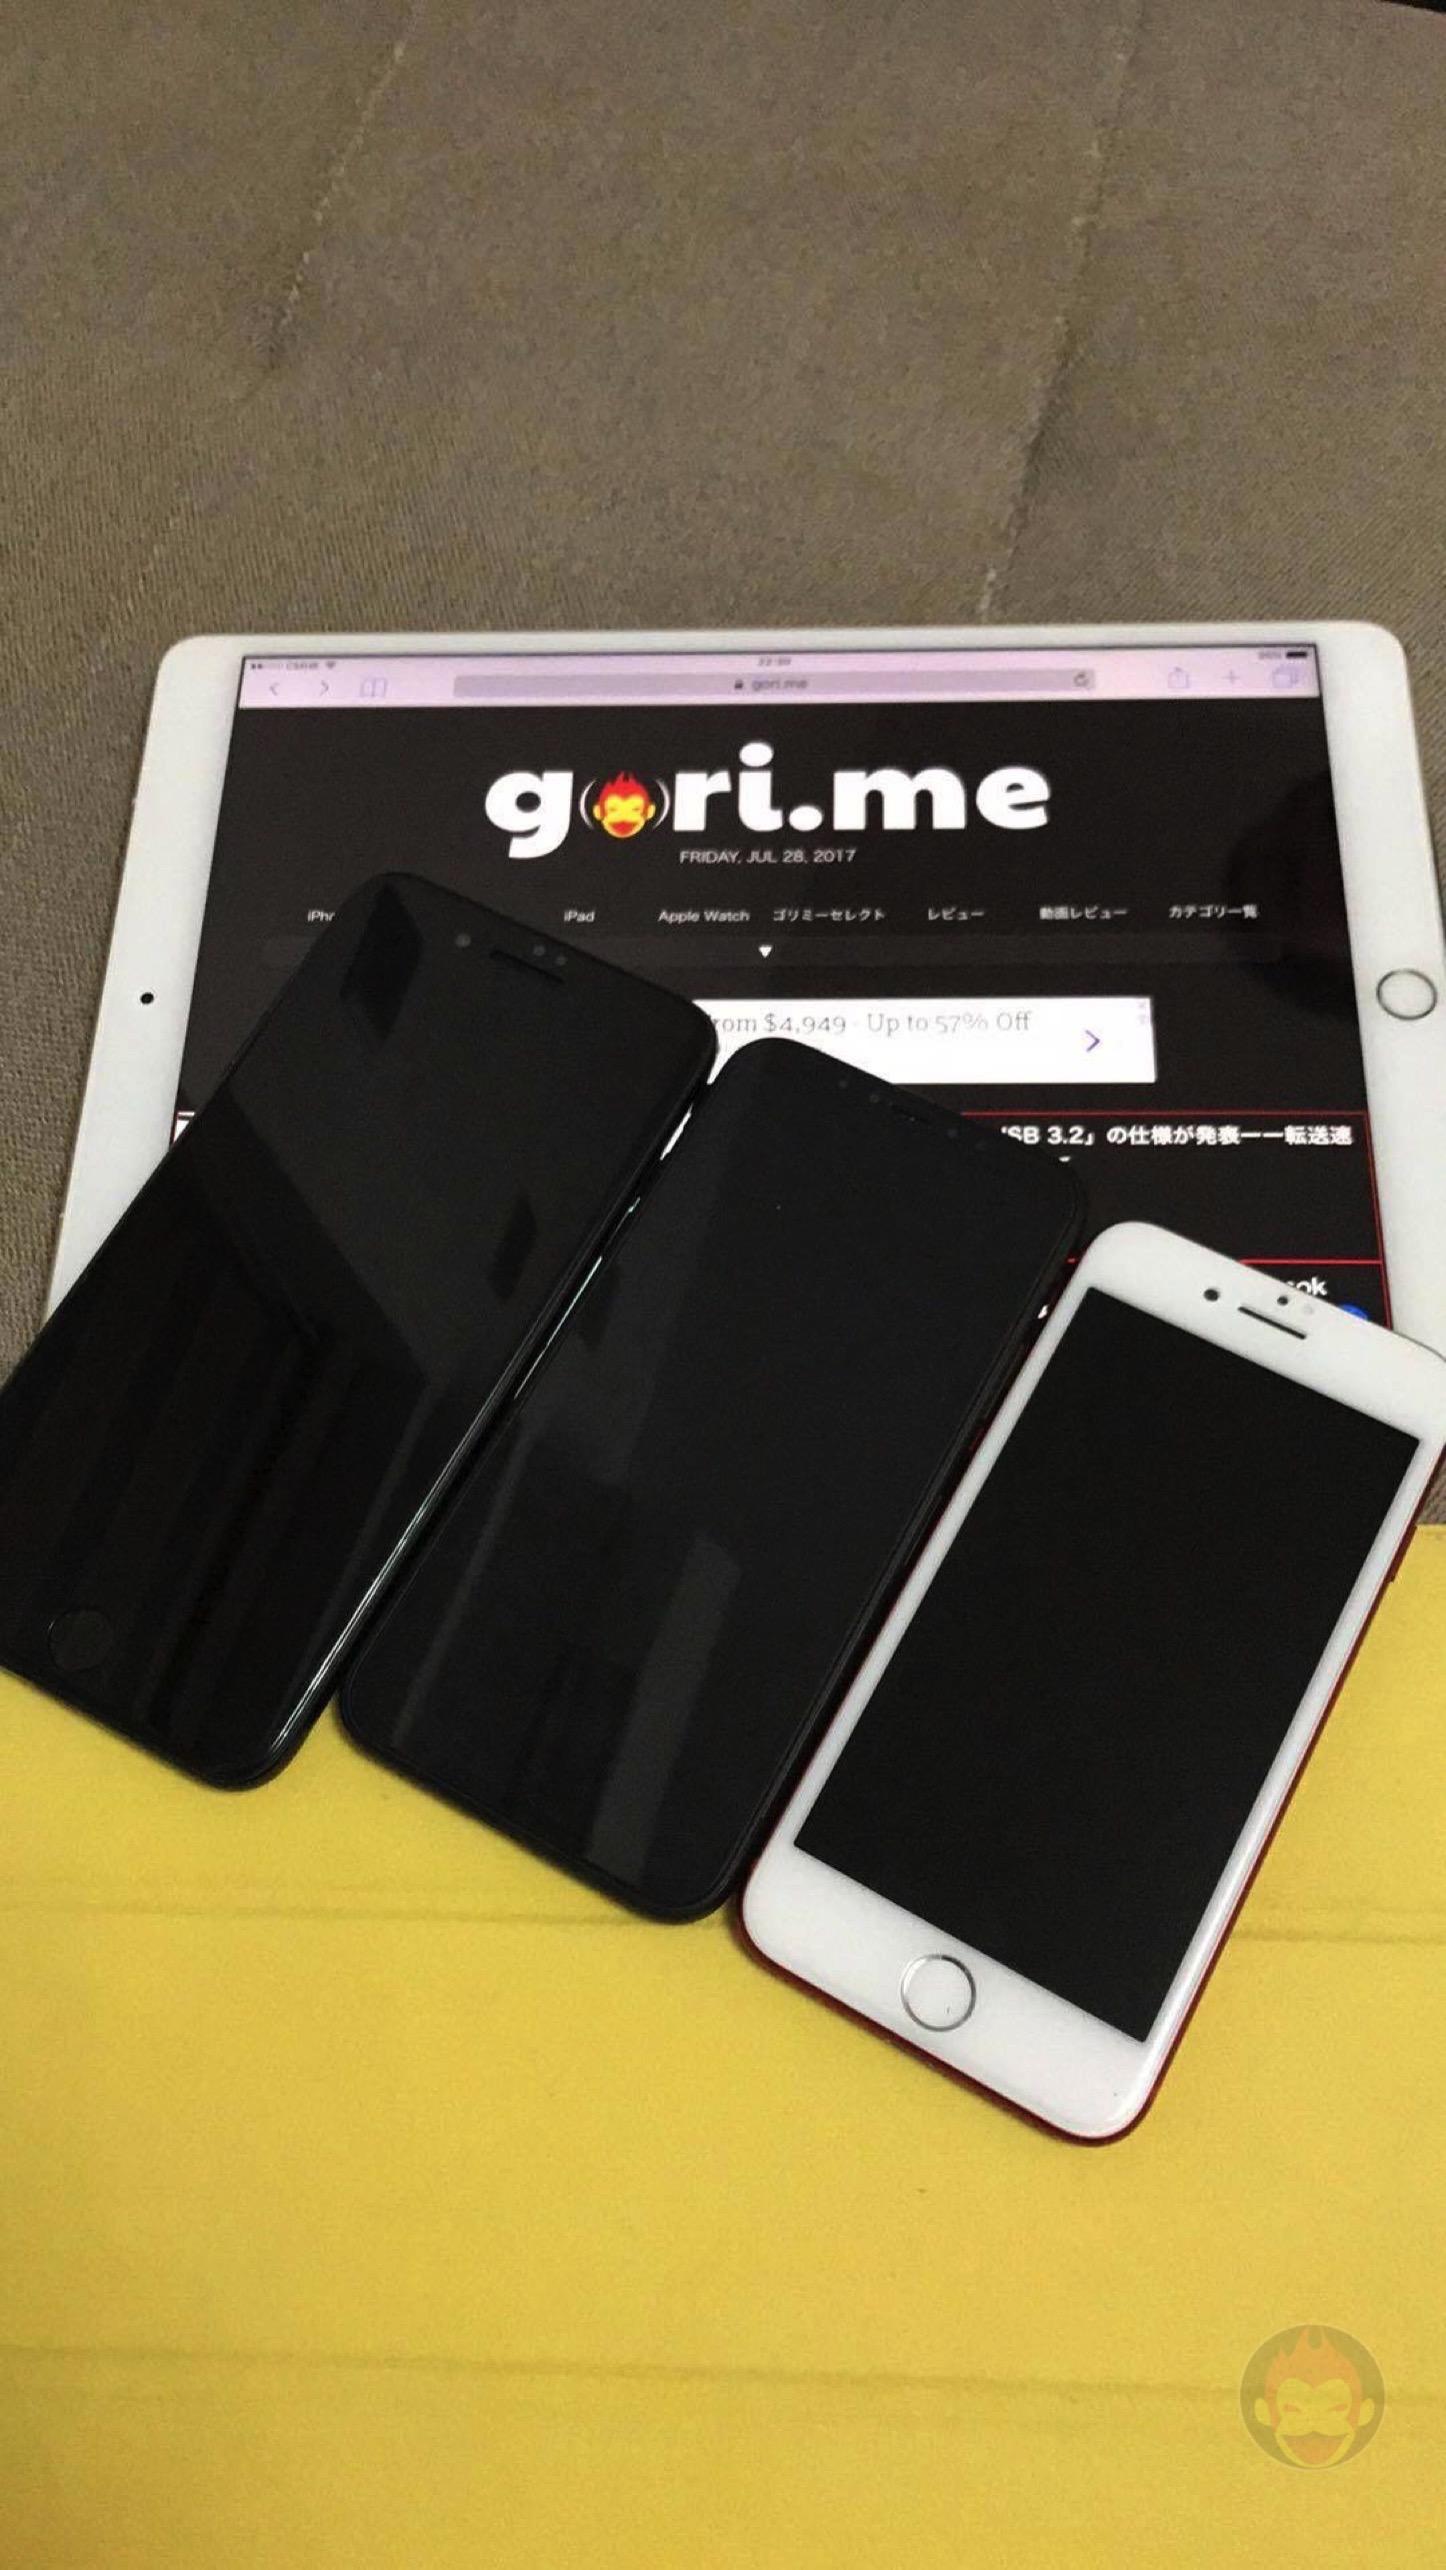 iPhone-Pro-8-Edition-Mockup-GoriMe-15.jpg